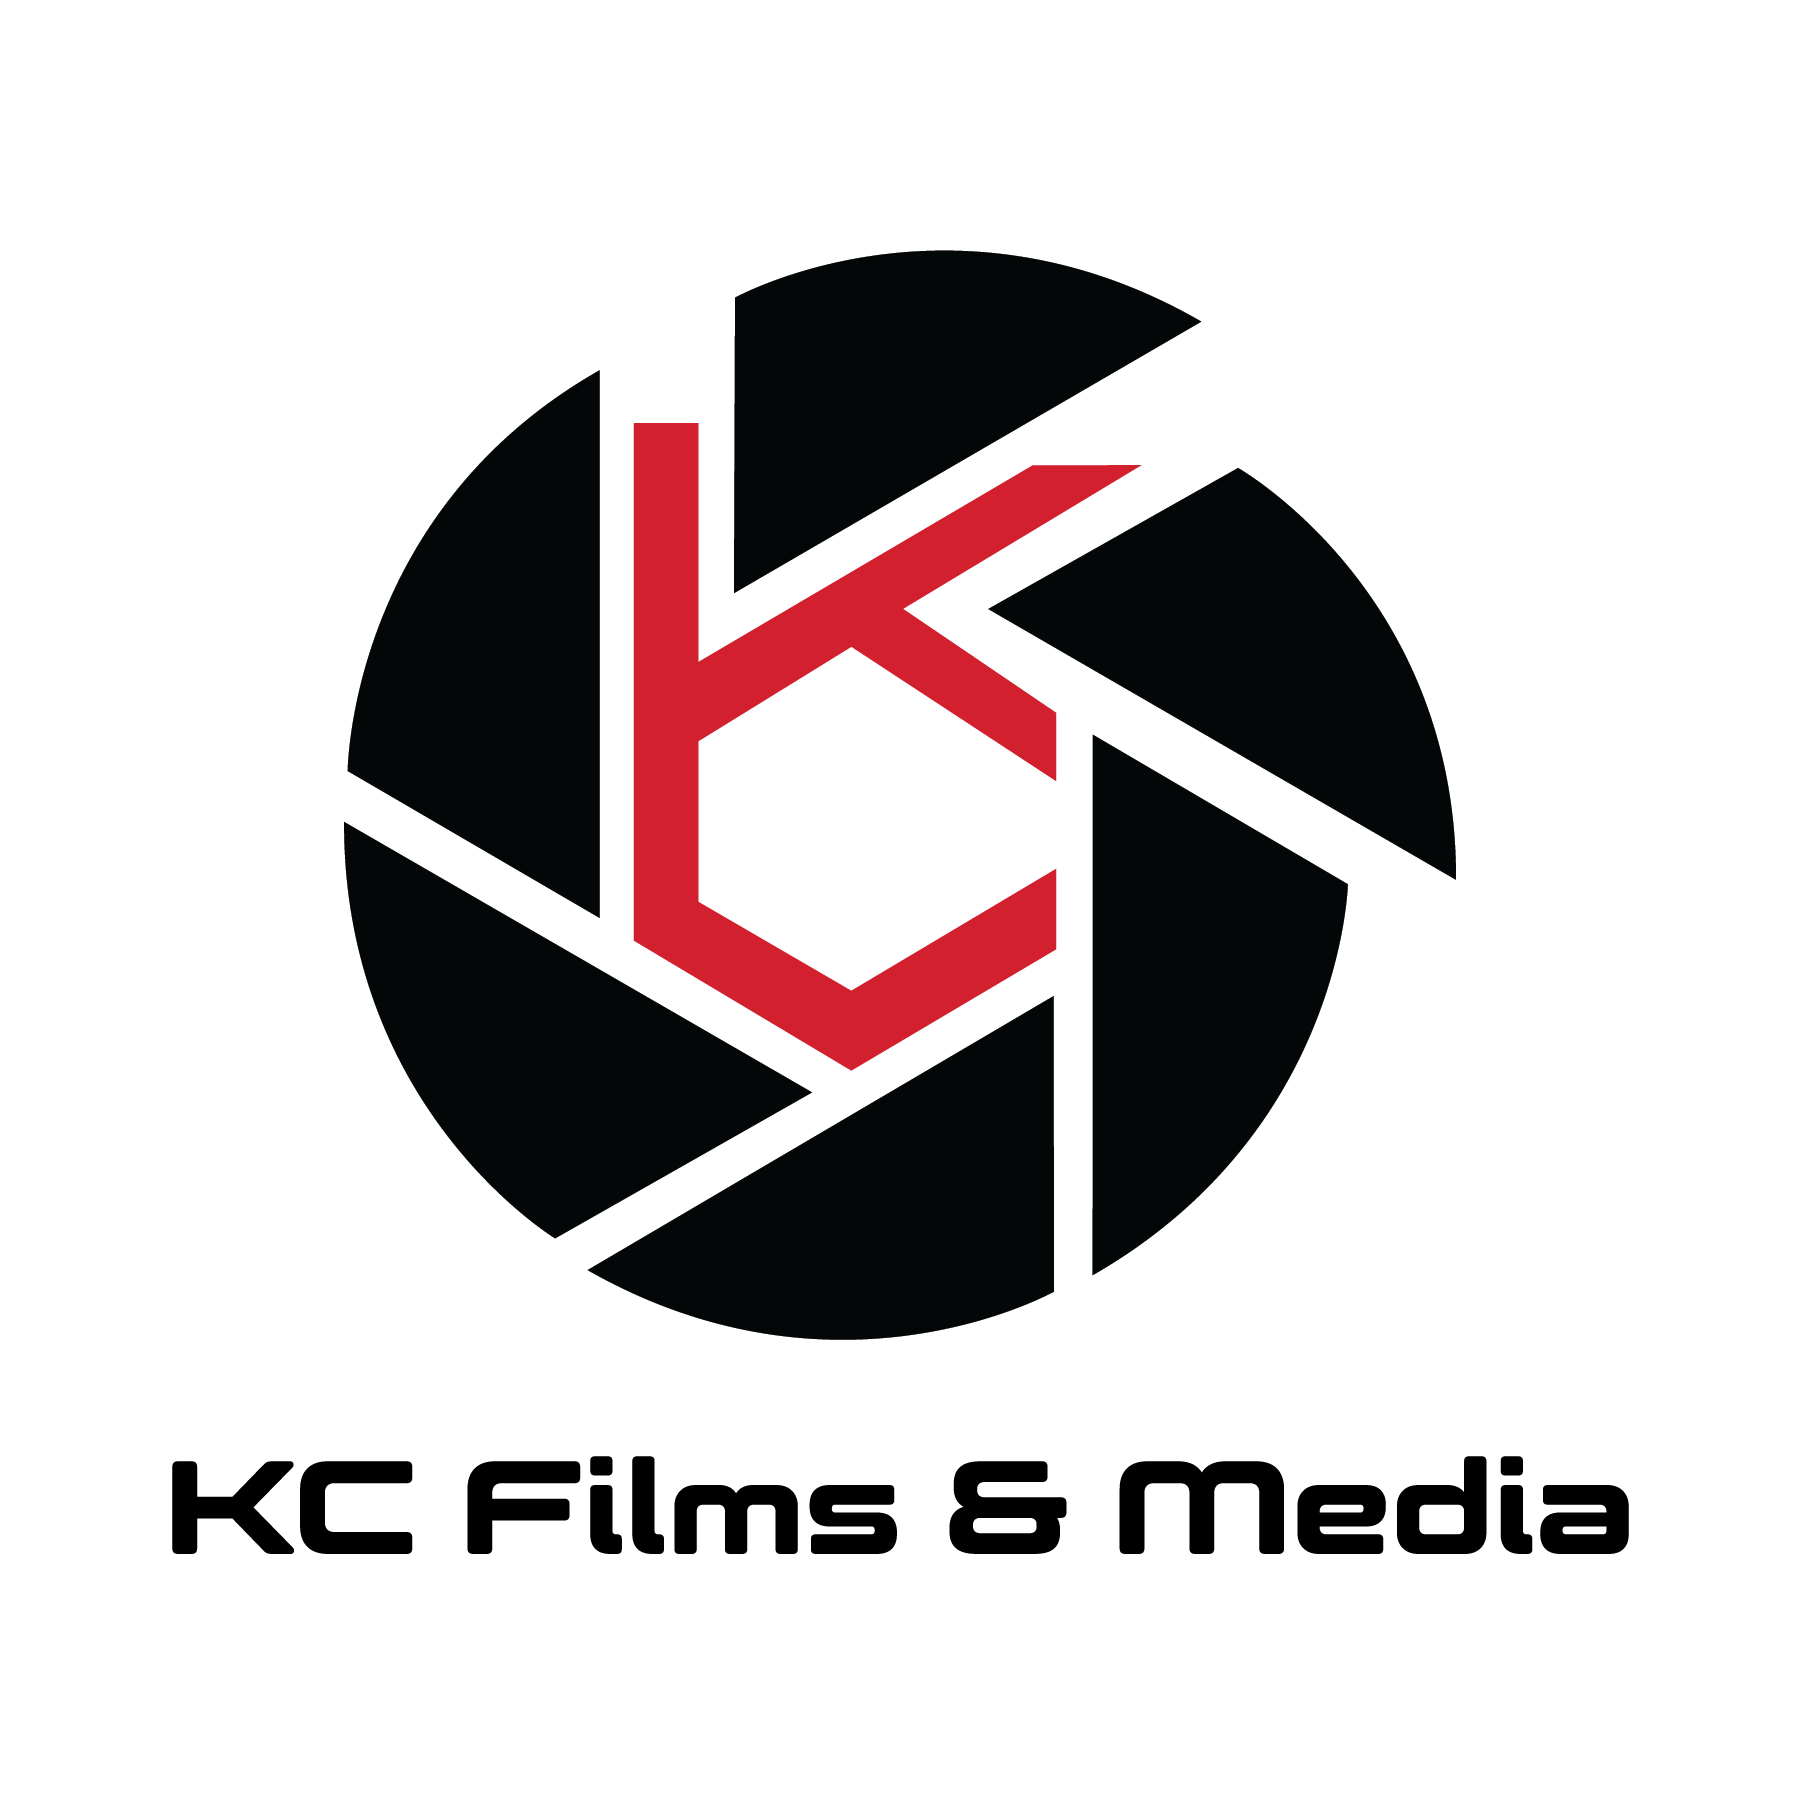 KCFILMS&MEDIA